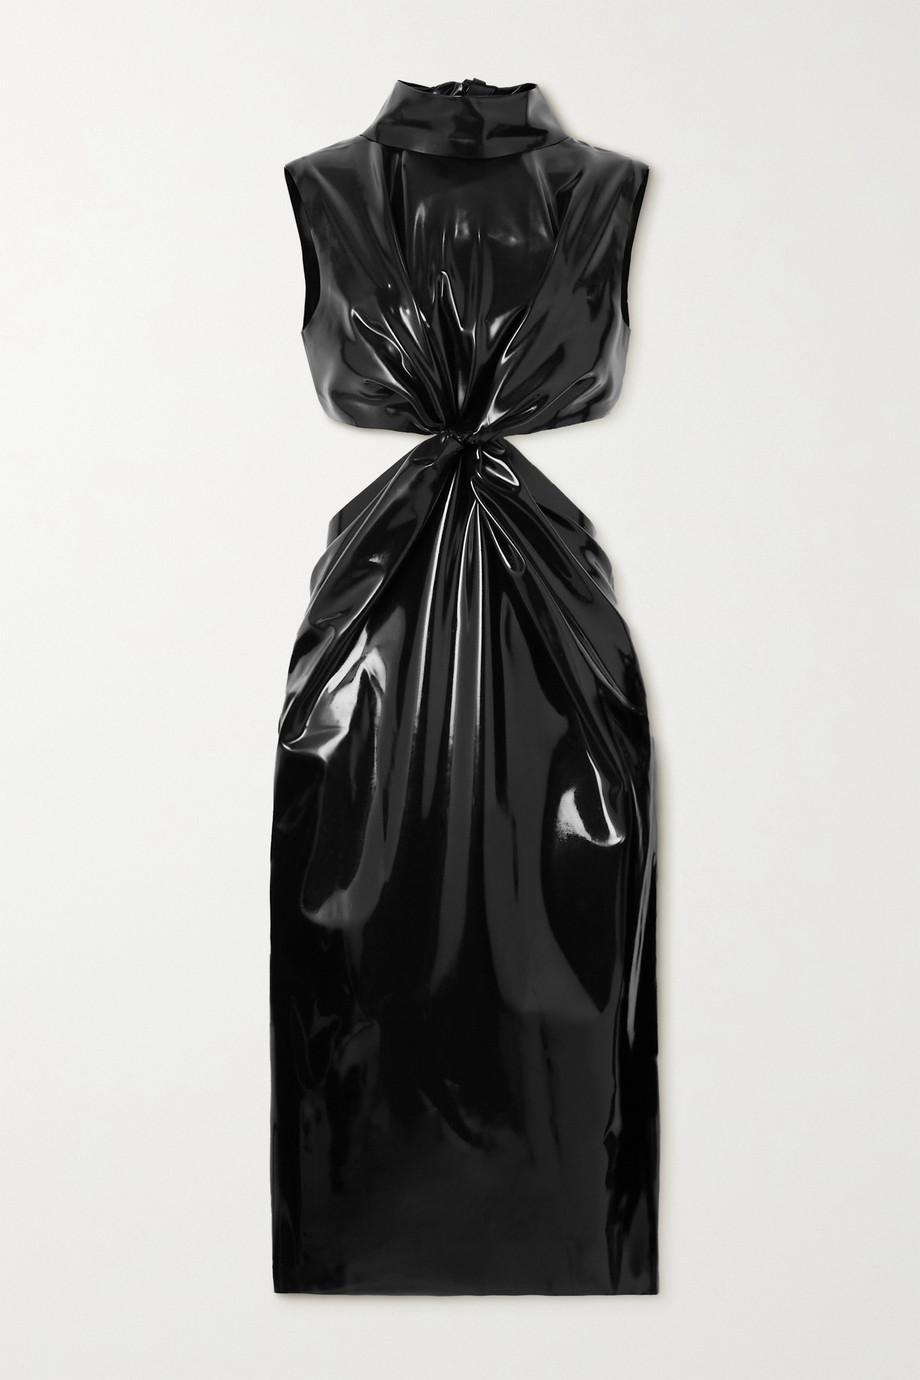 SAINT LAURENT Knotted cutout latex dress + Latex Care cleaning kit 3 x 30ml bottles (Vividress, Vivishine, Viviclean)